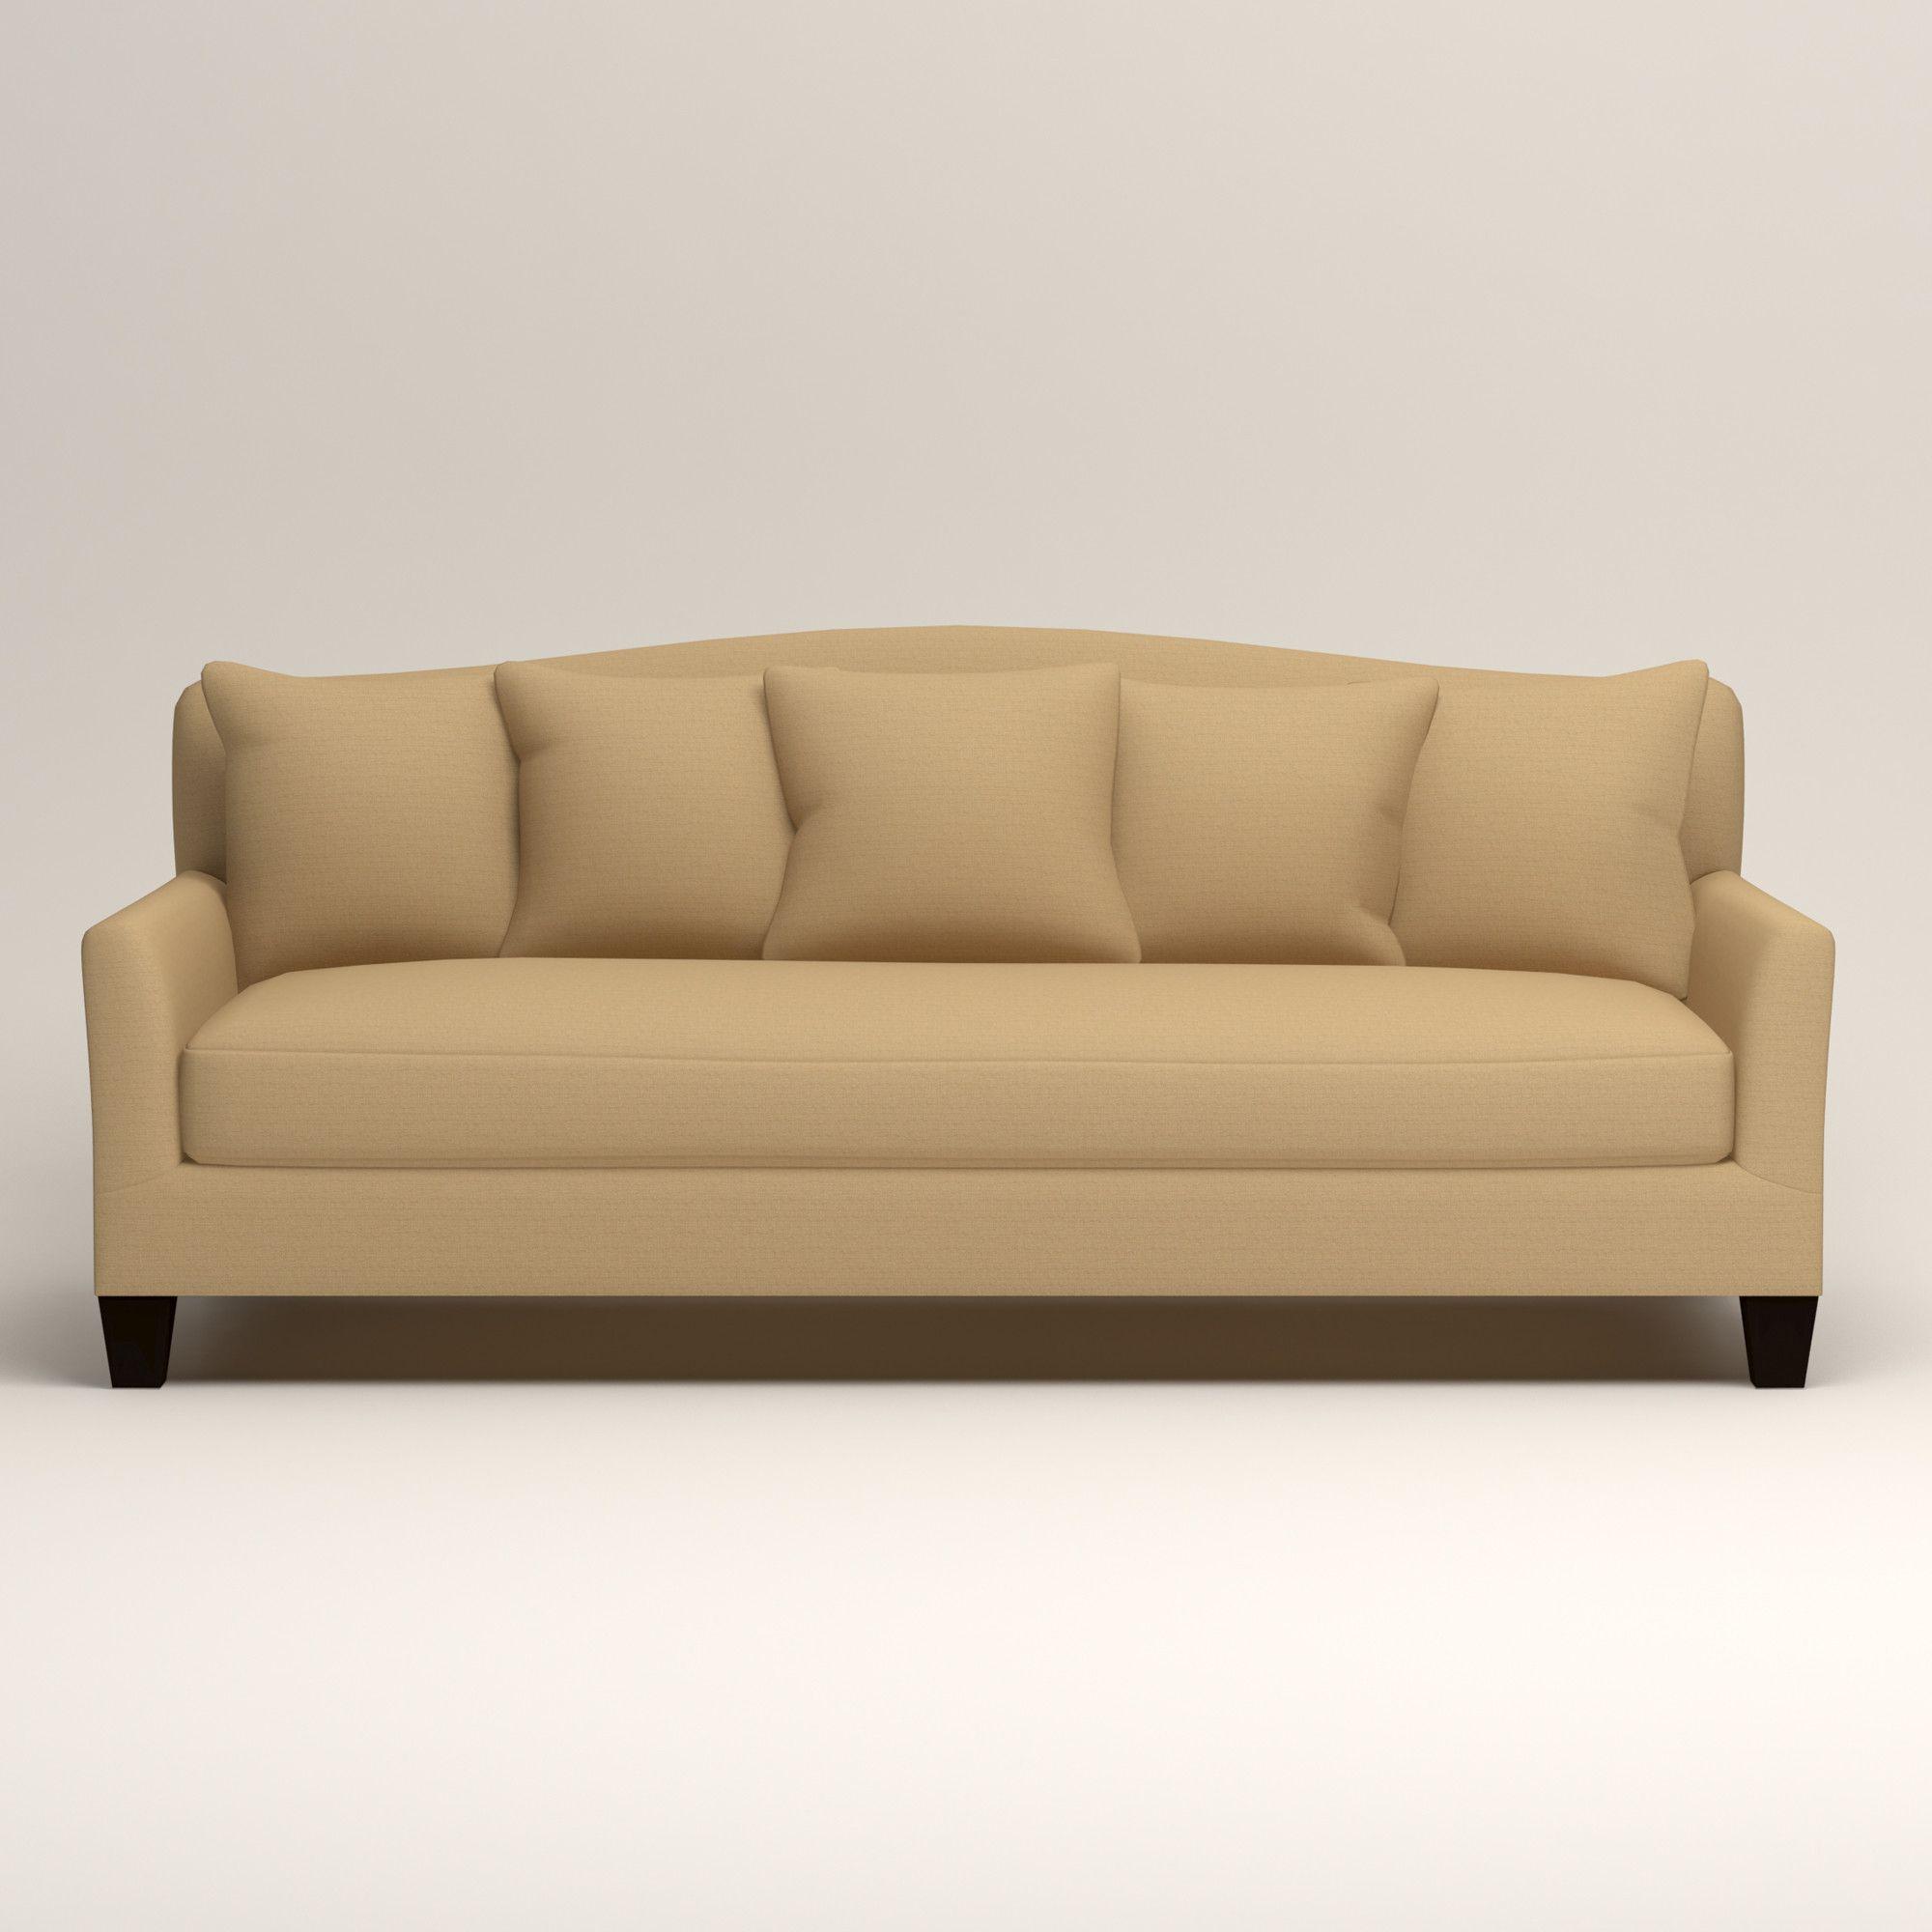 Chic Living Roomideas: Sofa, Furniture, Black